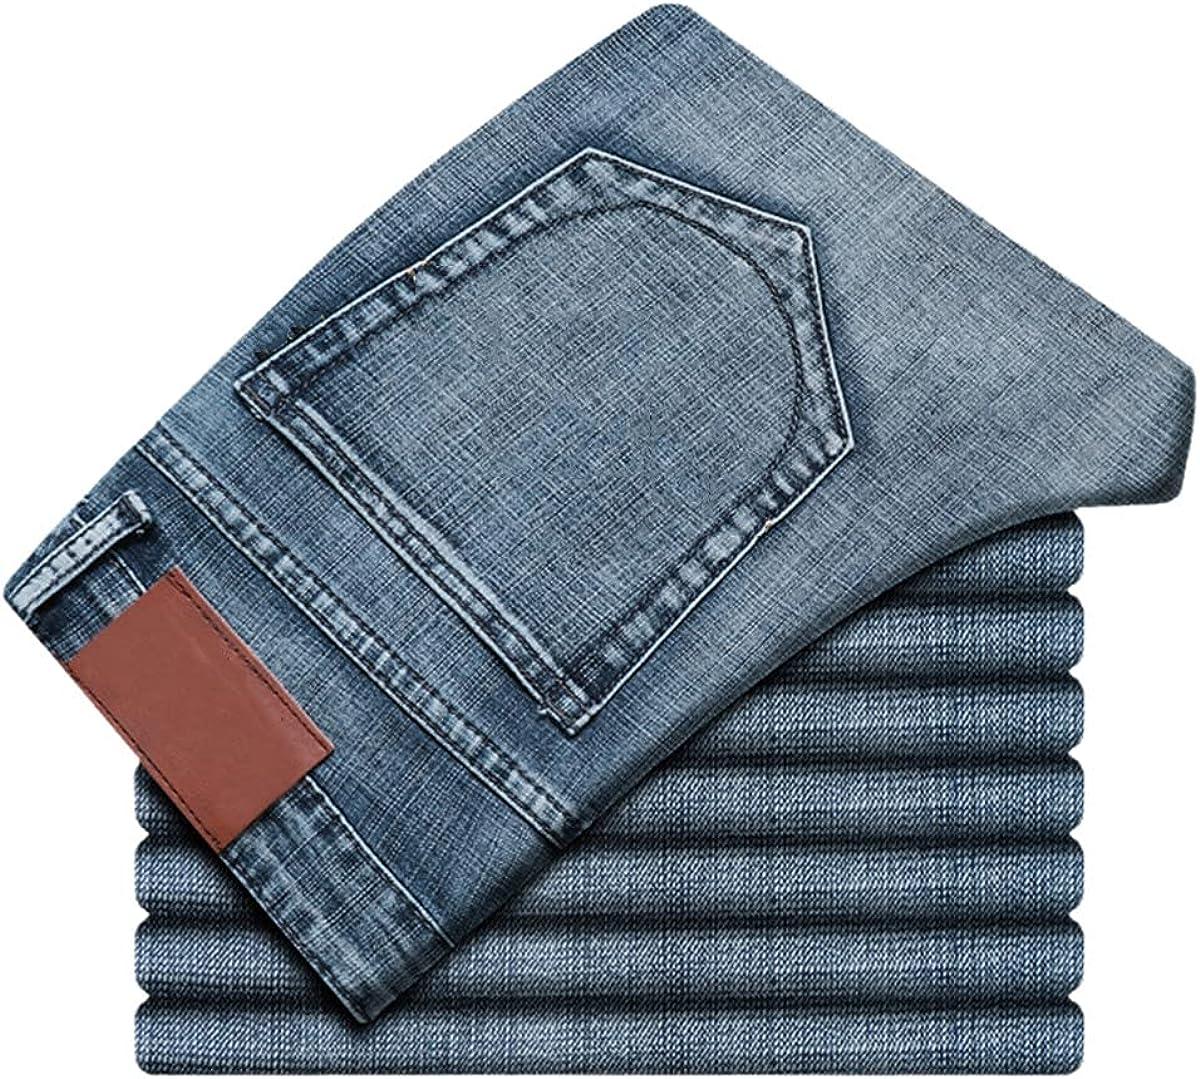 Fall Men's 5 Classic Jeans Stretch Slim Thin Denim Trousers Business Casual Classic